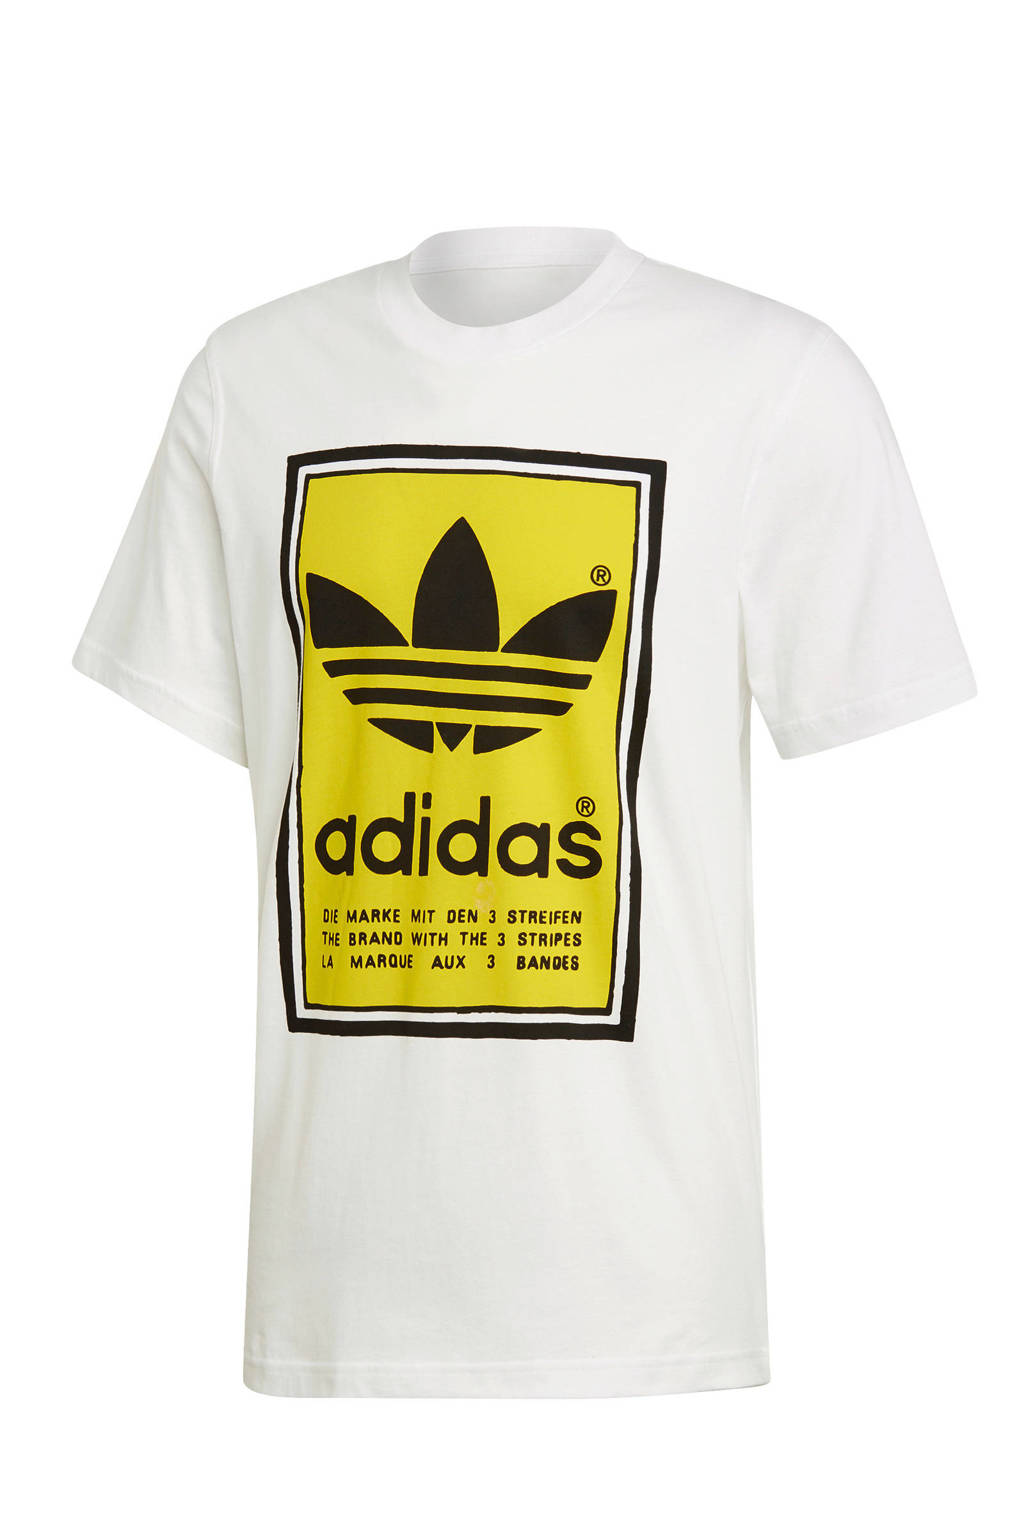 adidas Originals   T-shirt wit/geel, Wit/geel